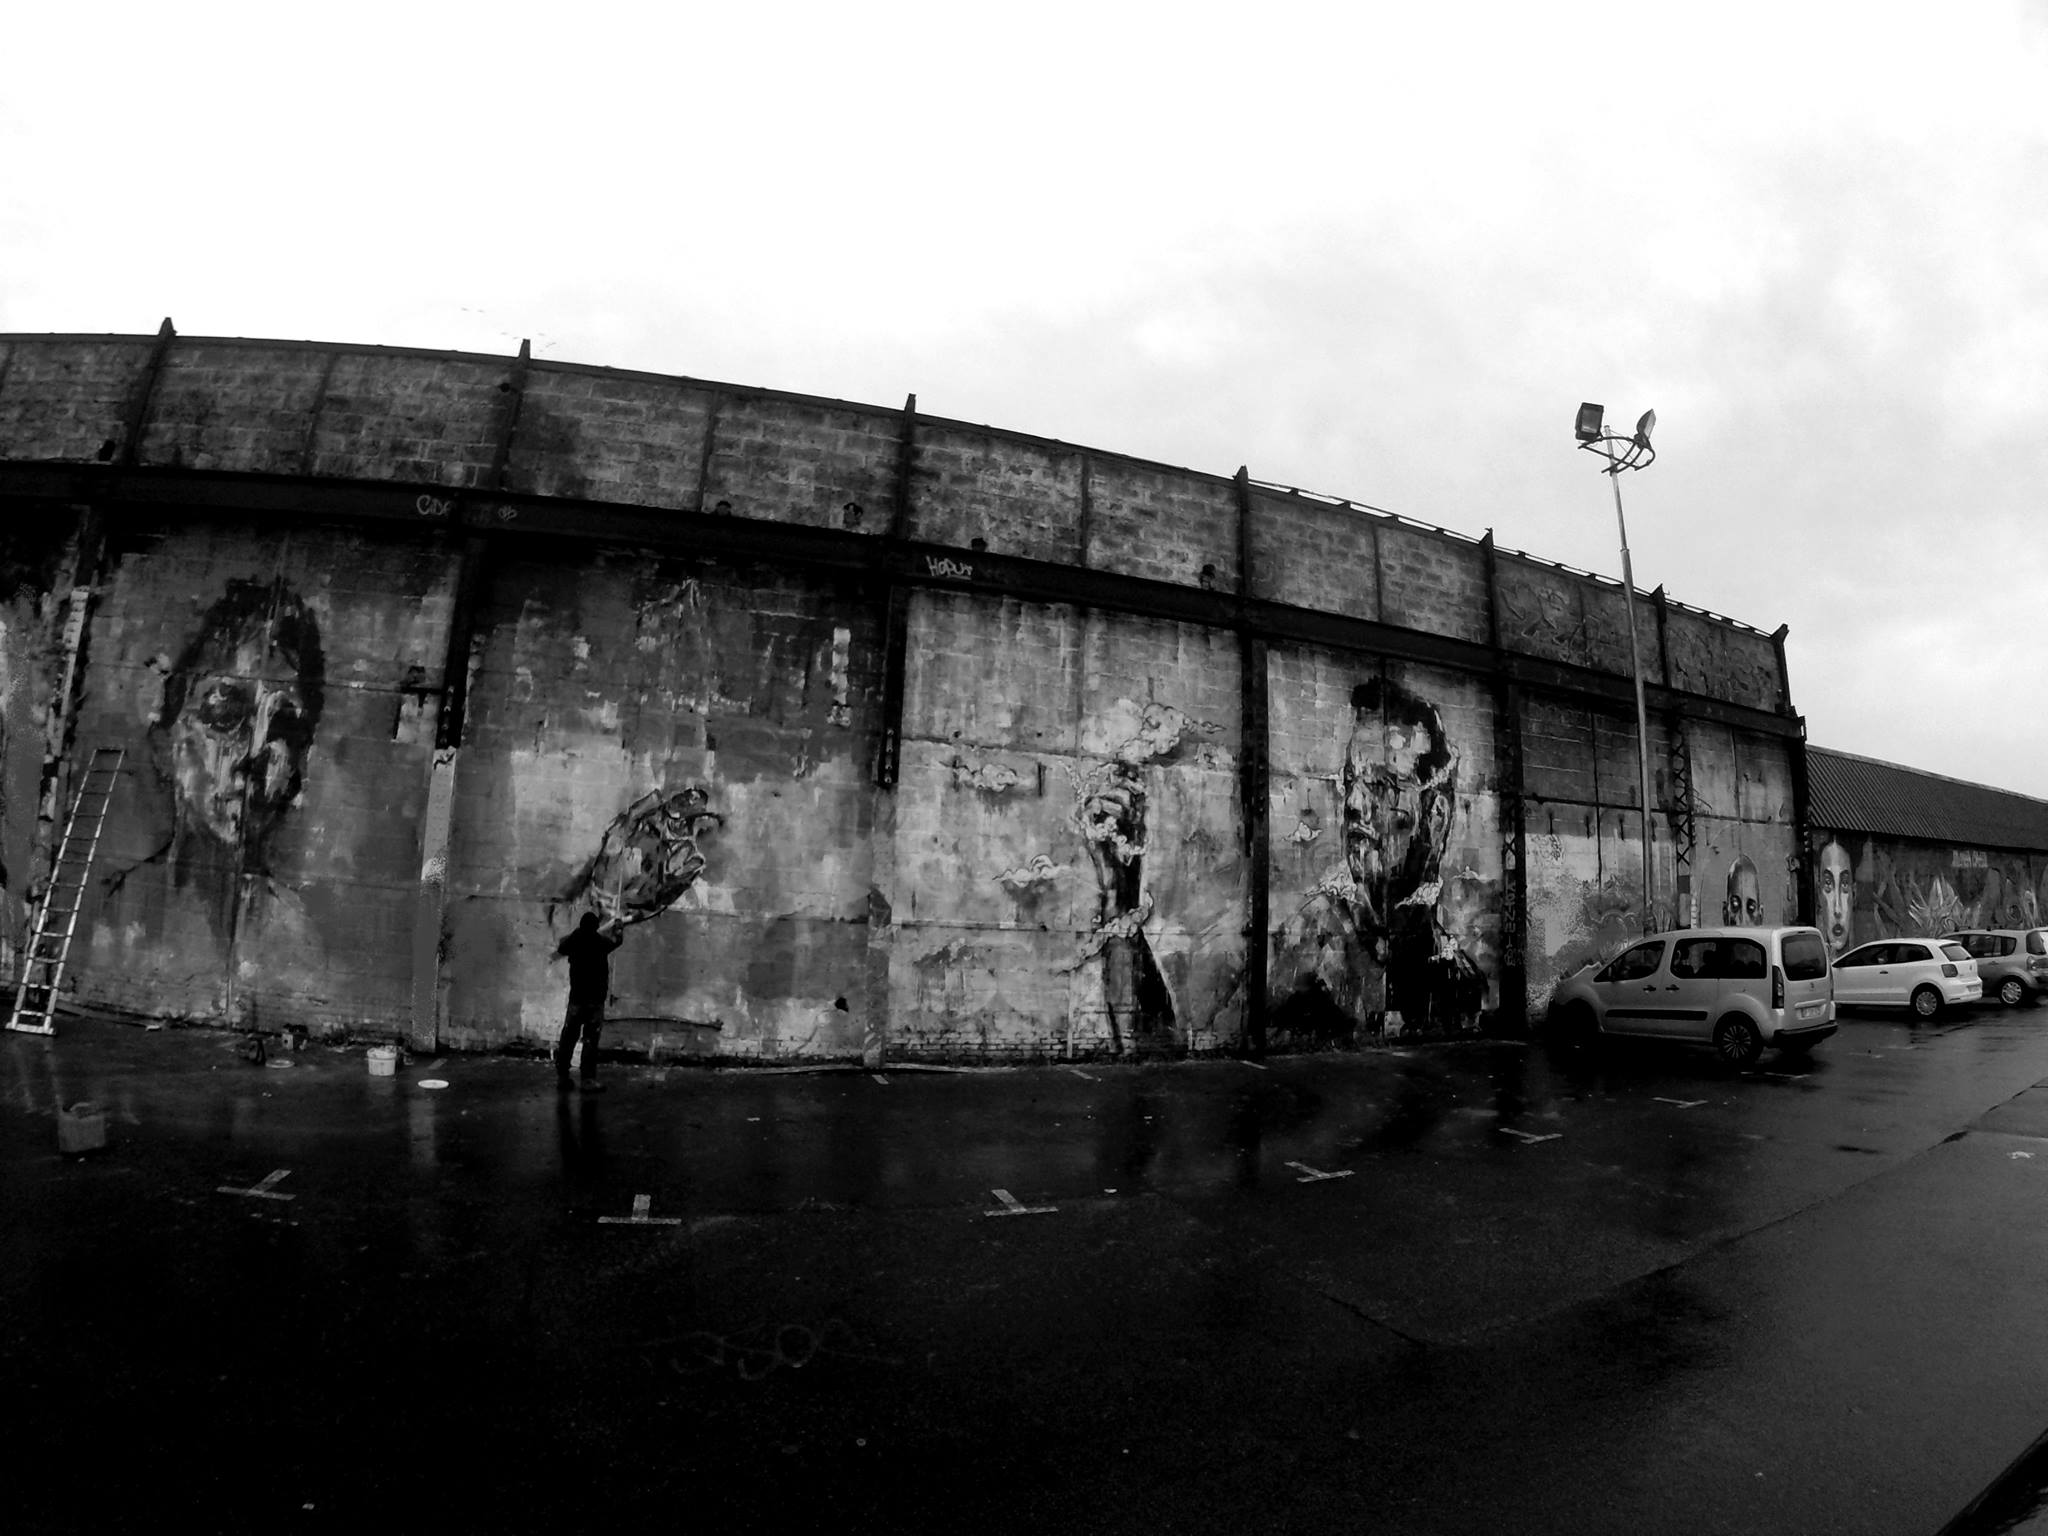 street-art-portrait-triste-23